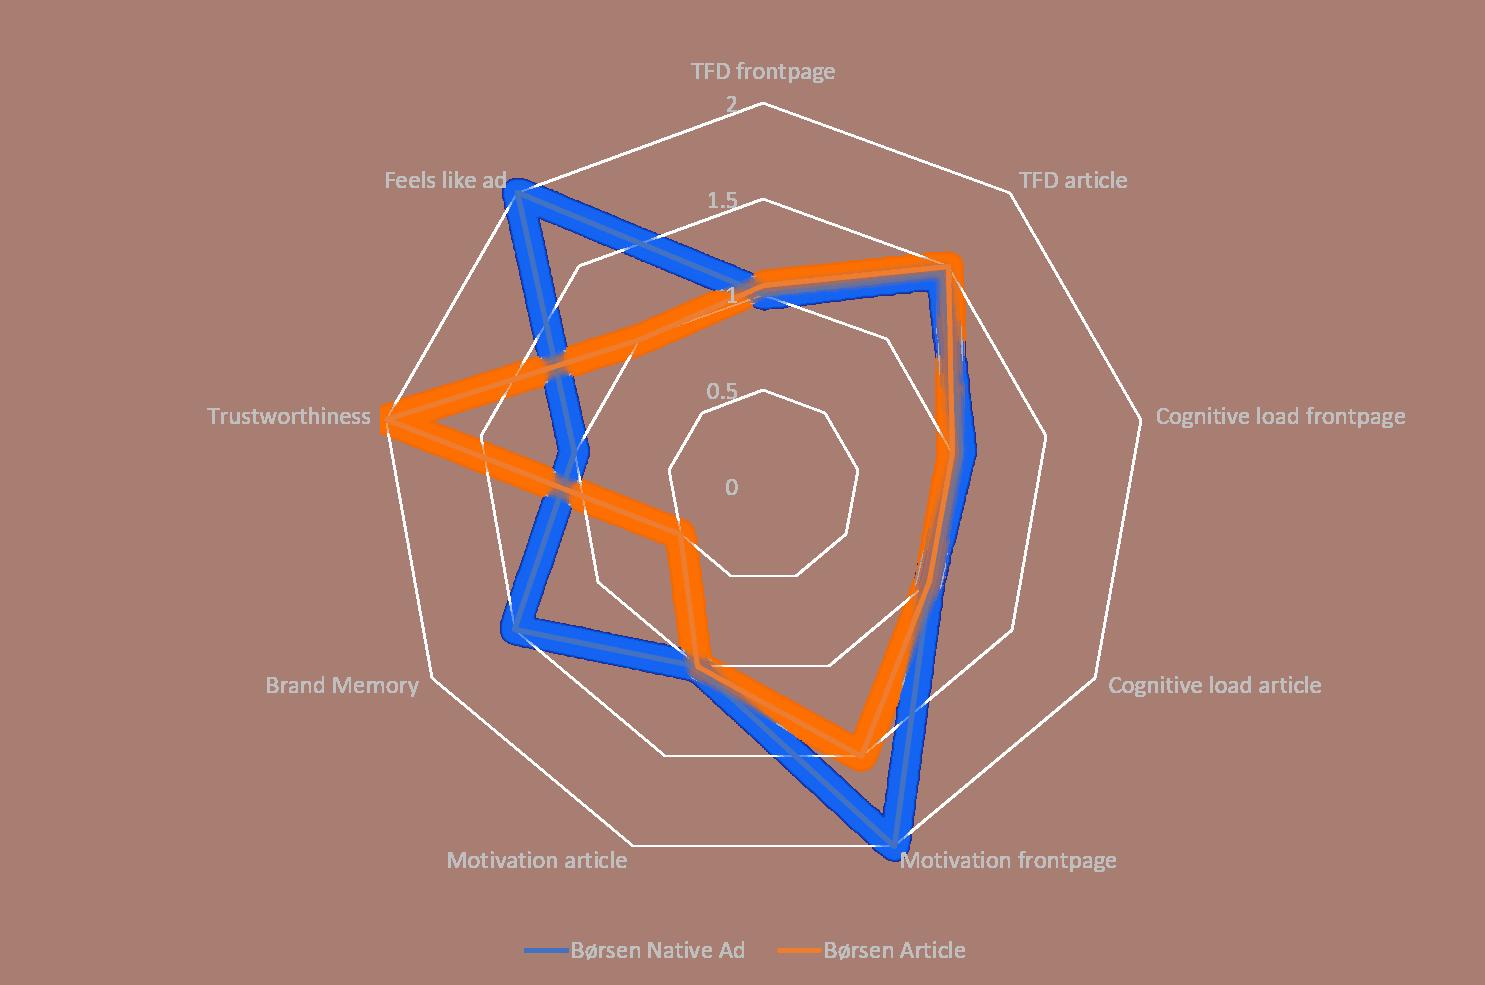 Spider plot of ad types.